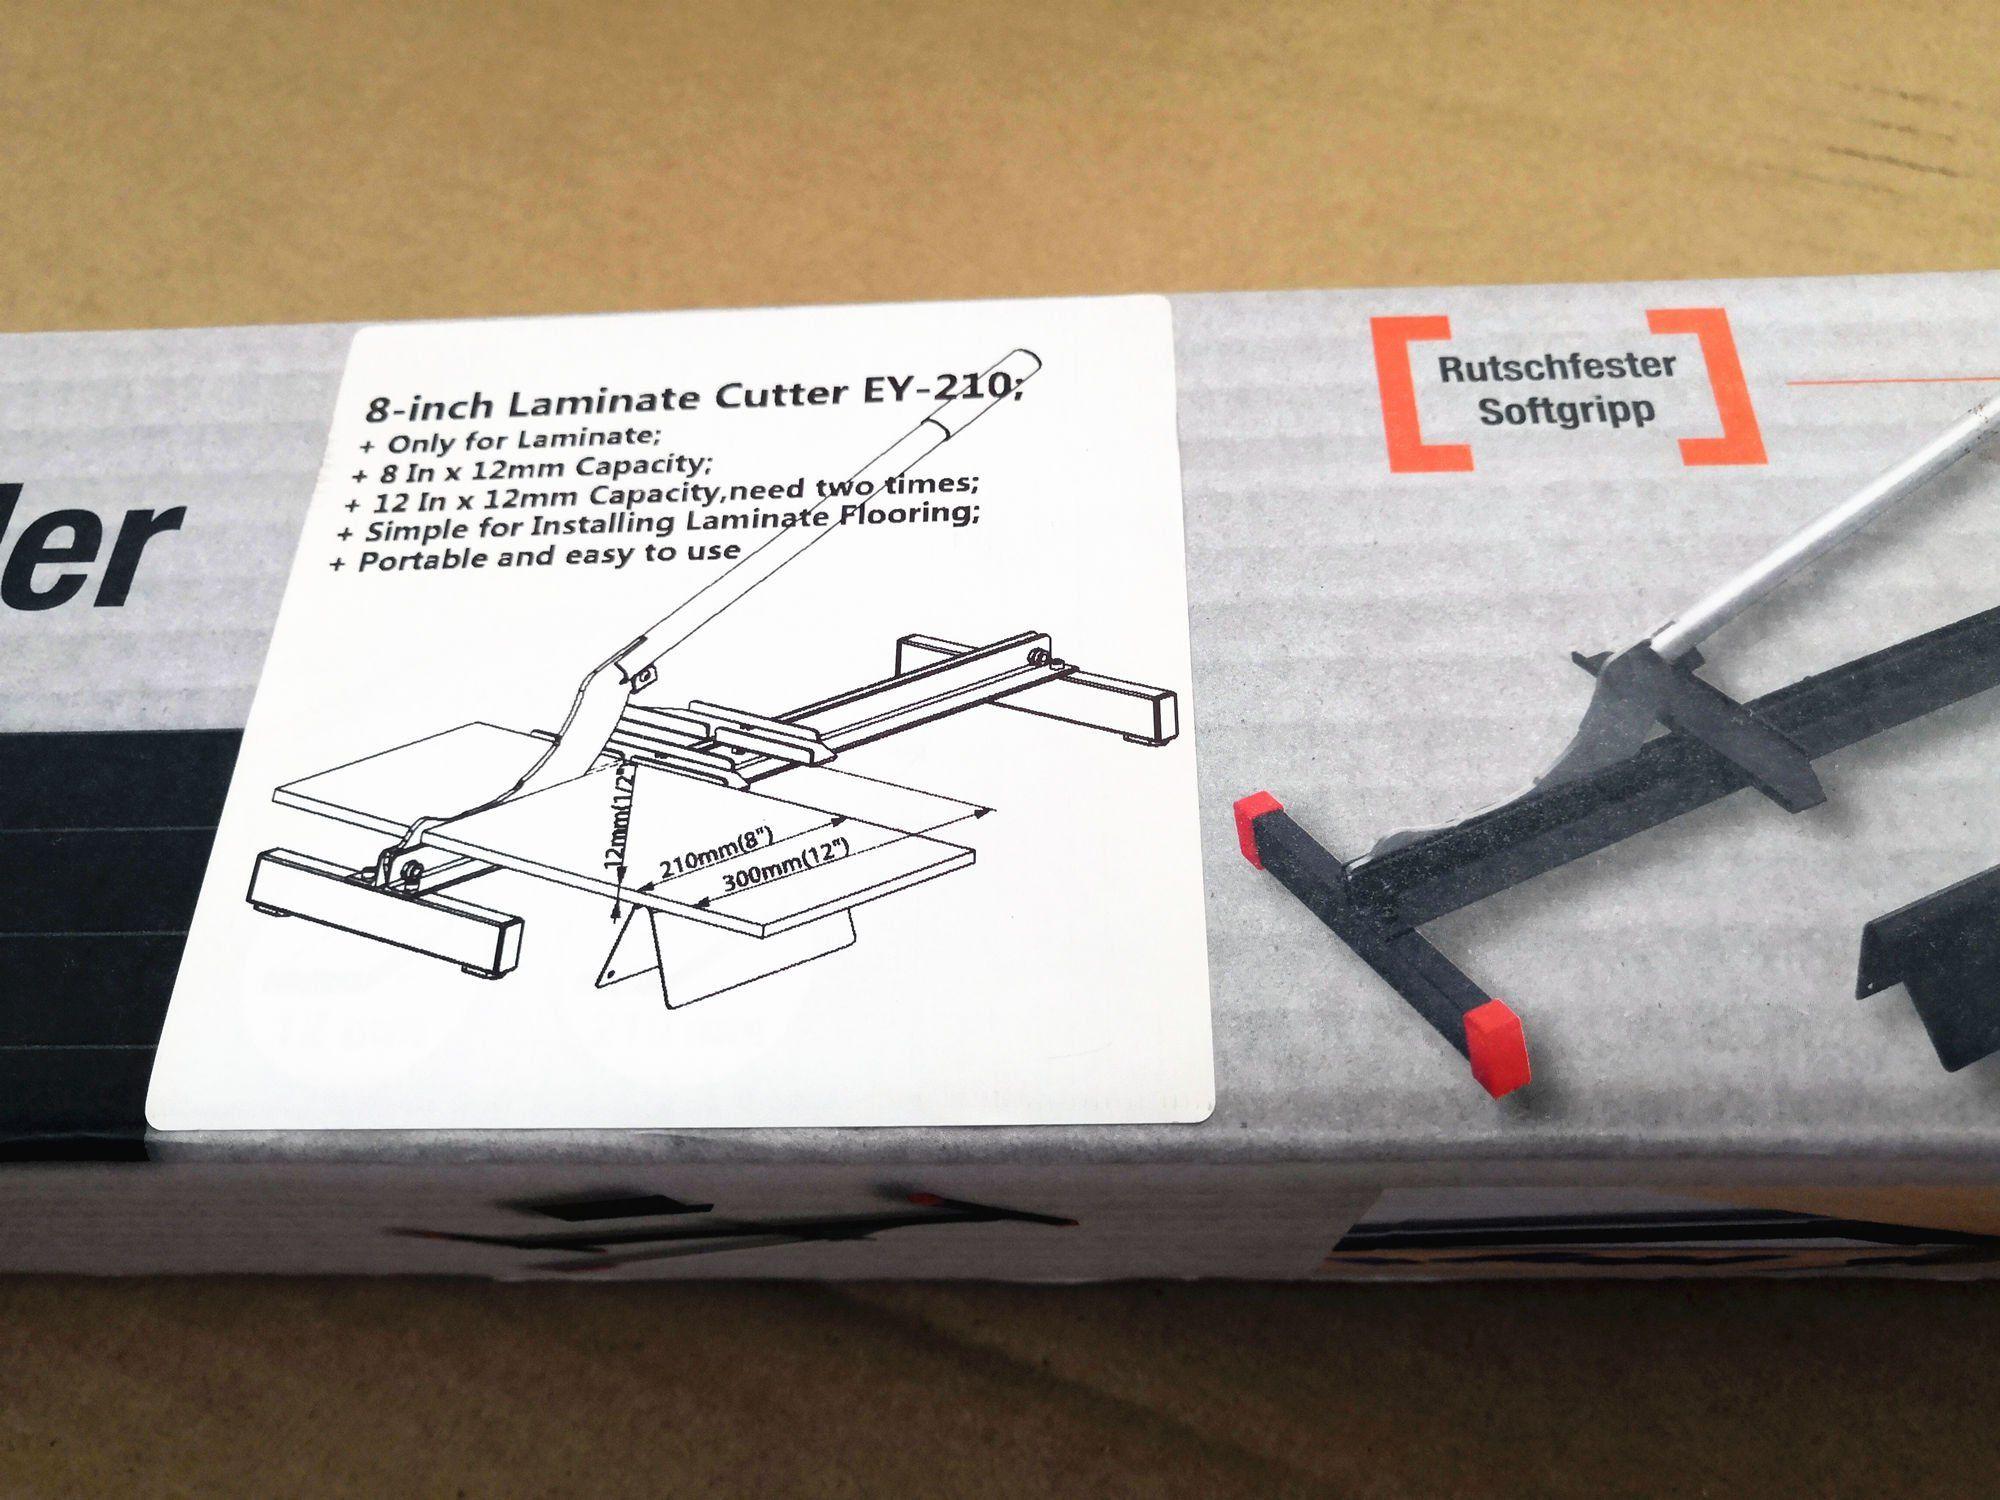 Mantistol Laminate Cutter Ey 210 For 8 Inch Laminate Flooring Laminate Flooring